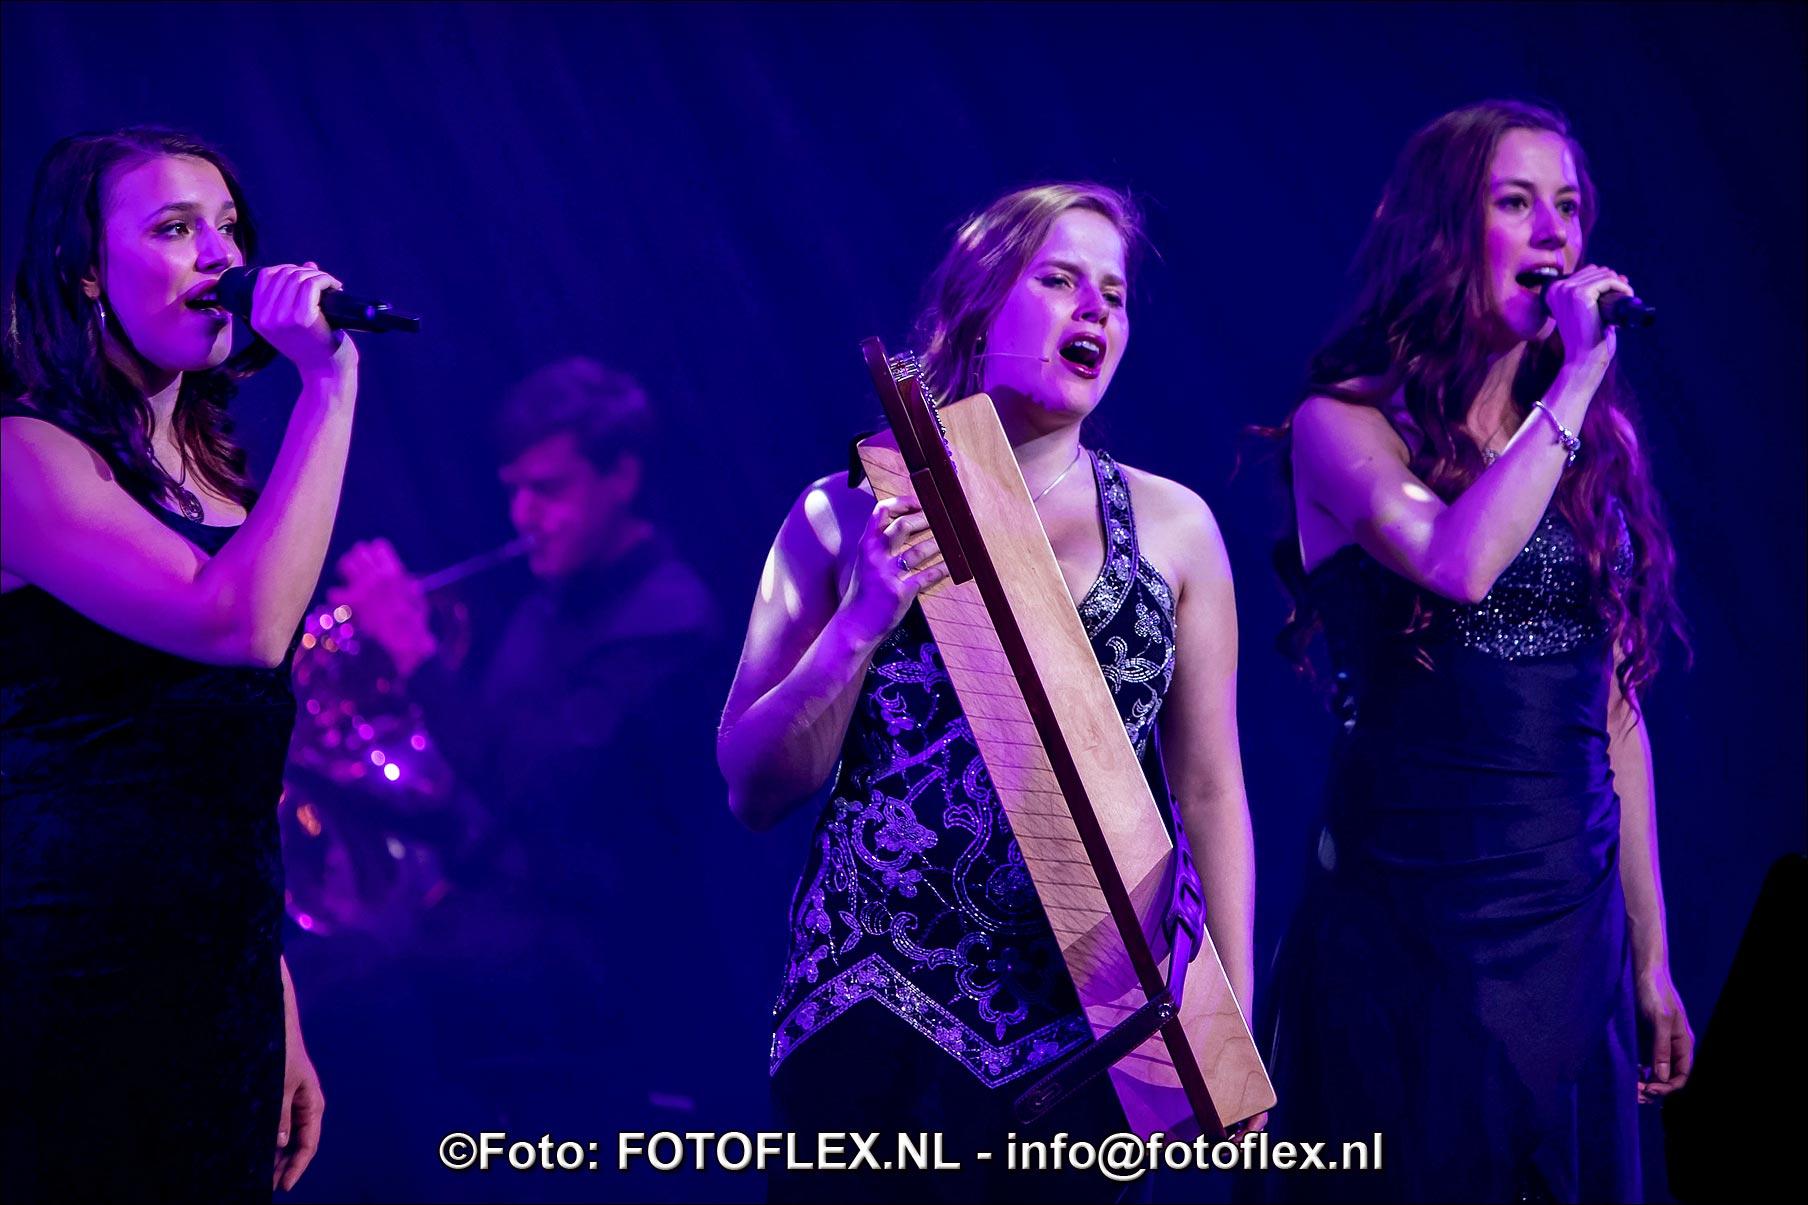 0380-CopyrightFOTOFLEX.NL07012020